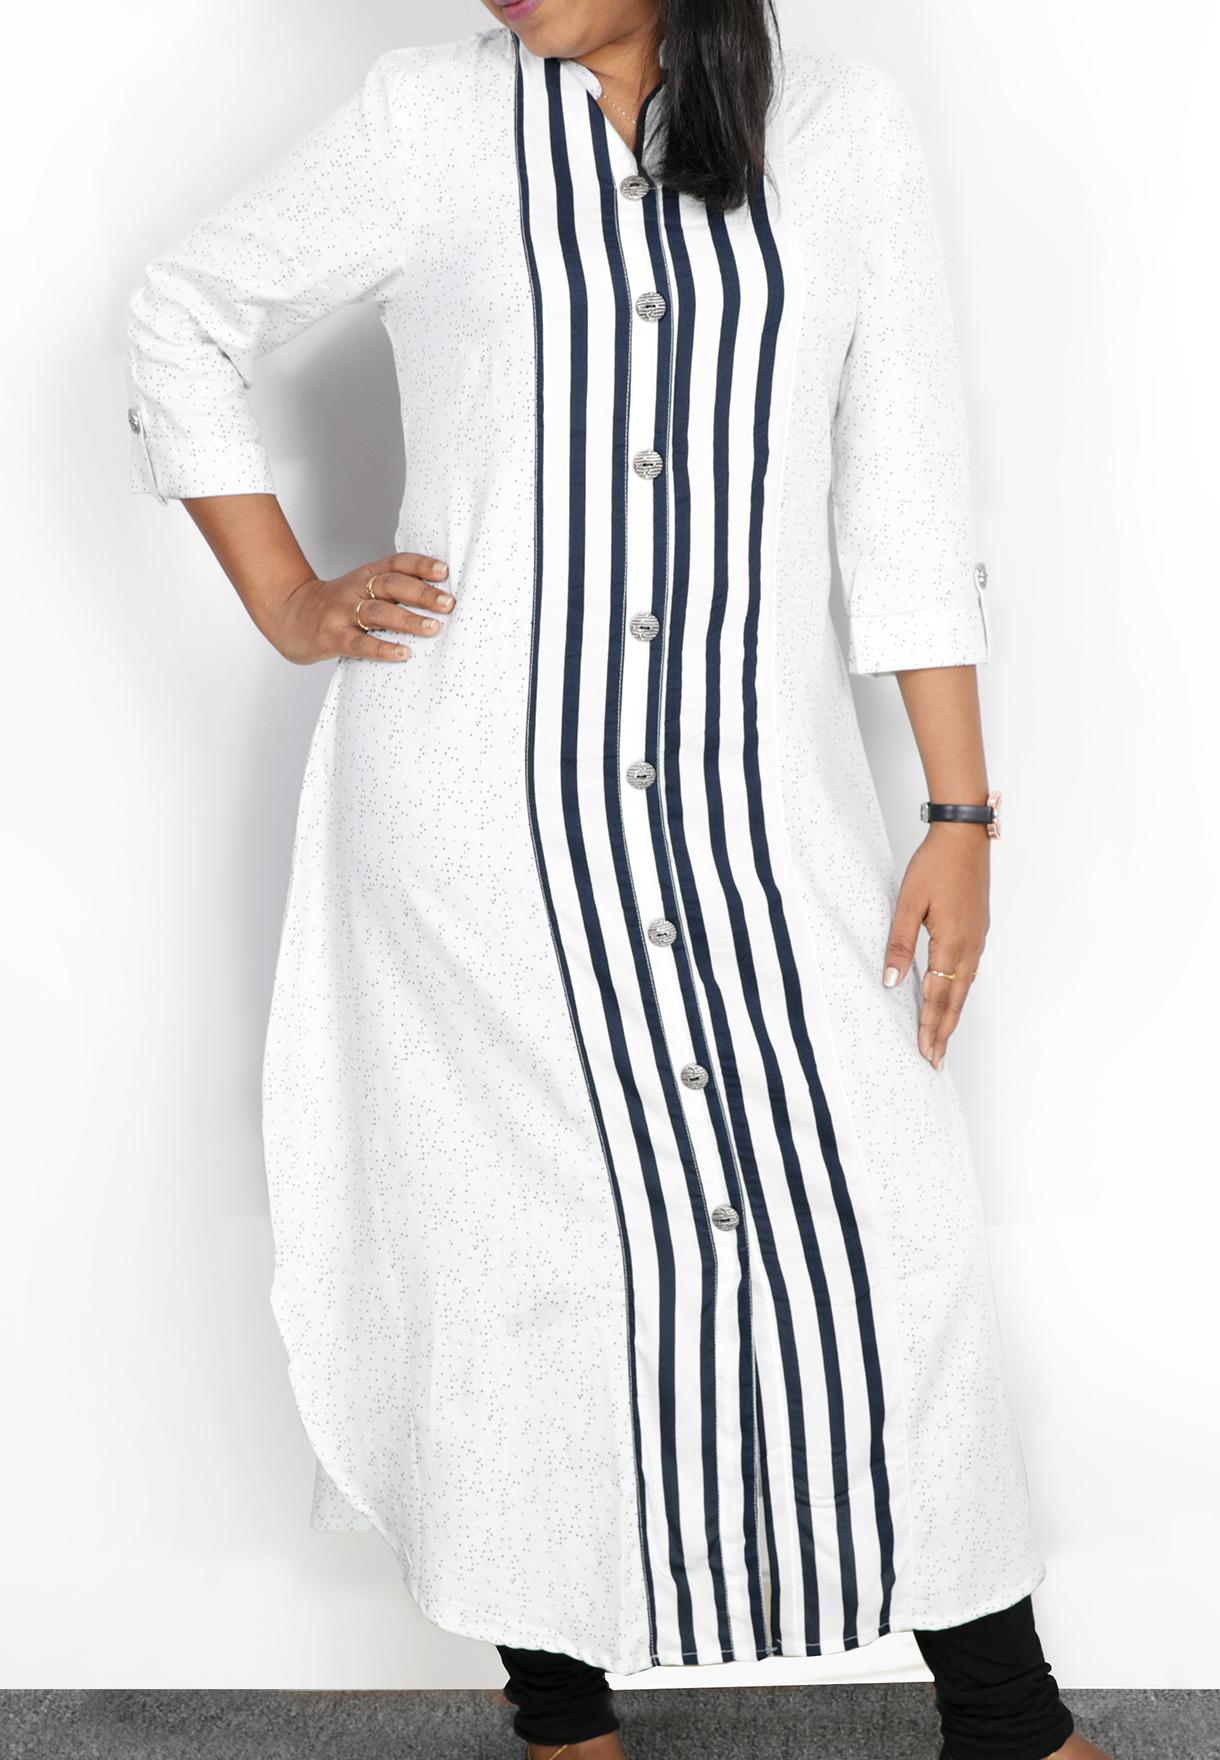 Ruky Fareen Long Top Full Sleeve Kurthees Cotton White Stripes - RF 106 - M